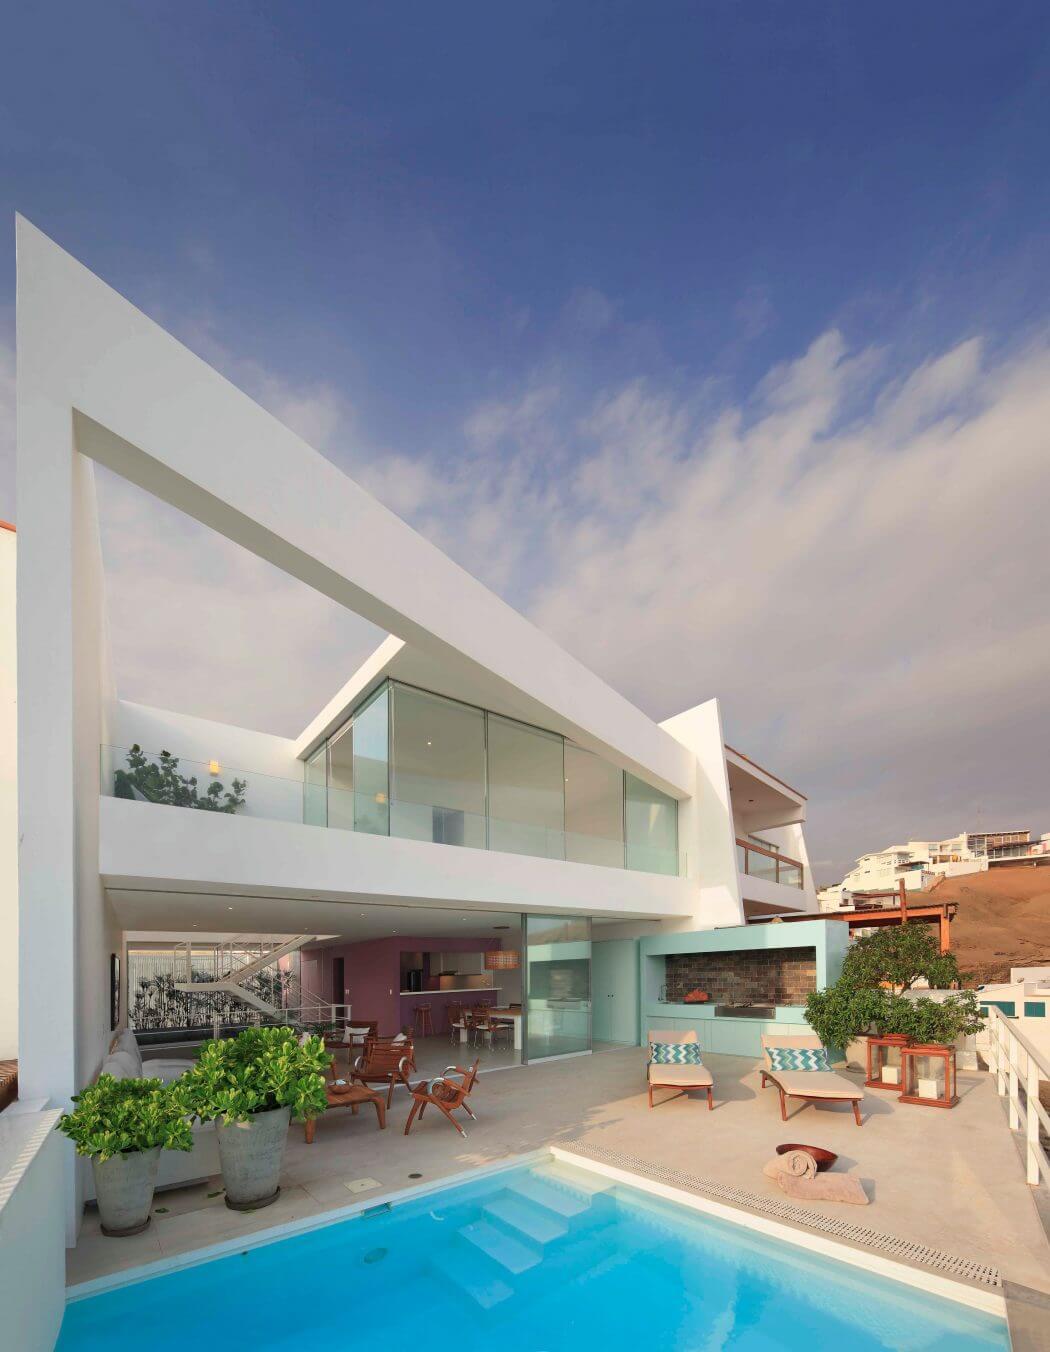 Casa Ave by Martin Dulanto Sangalli